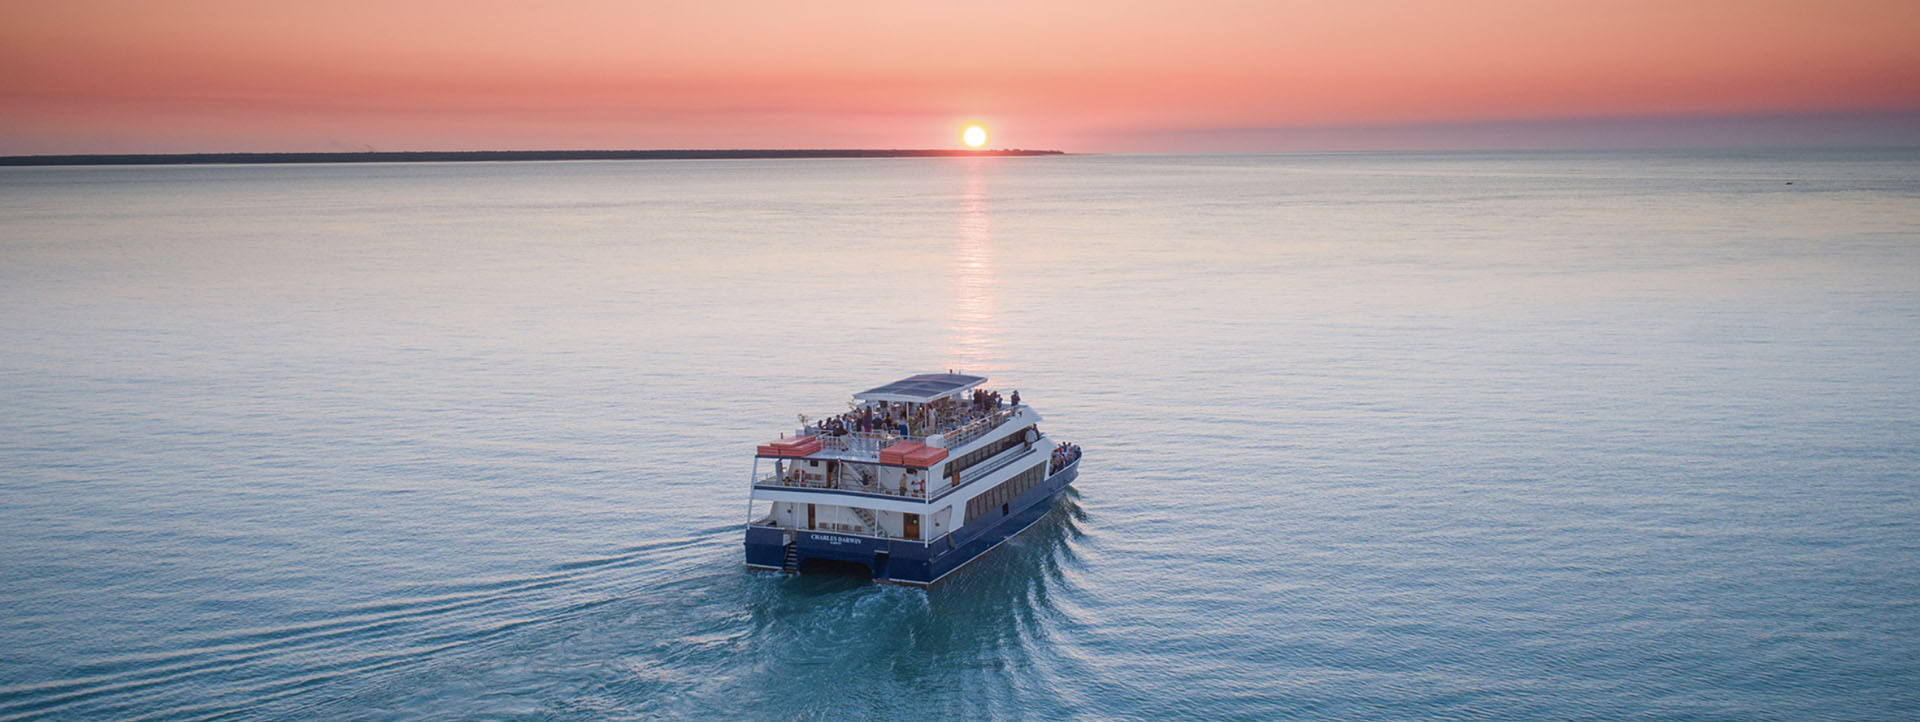 CHARLES DARWIN boat Darwin sunset cruises